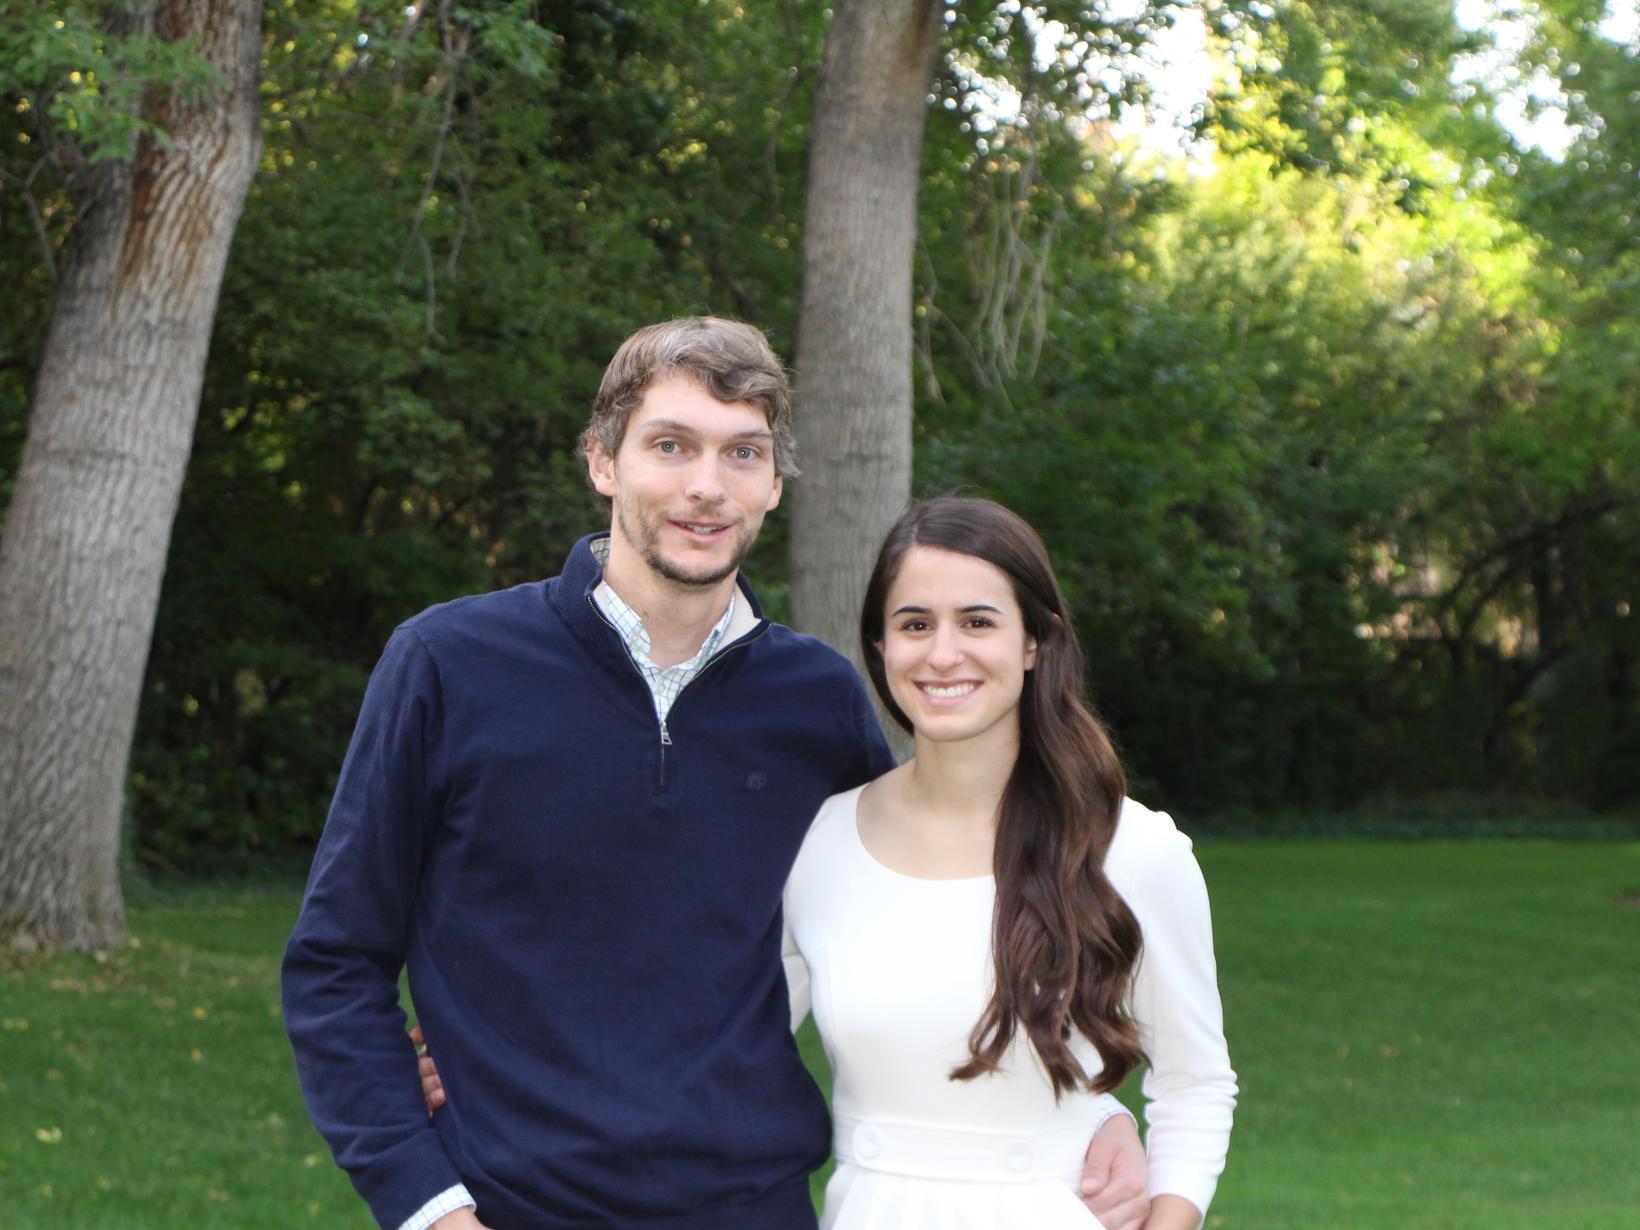 Veronica & Nate from Salt Lake City, Utah, United States